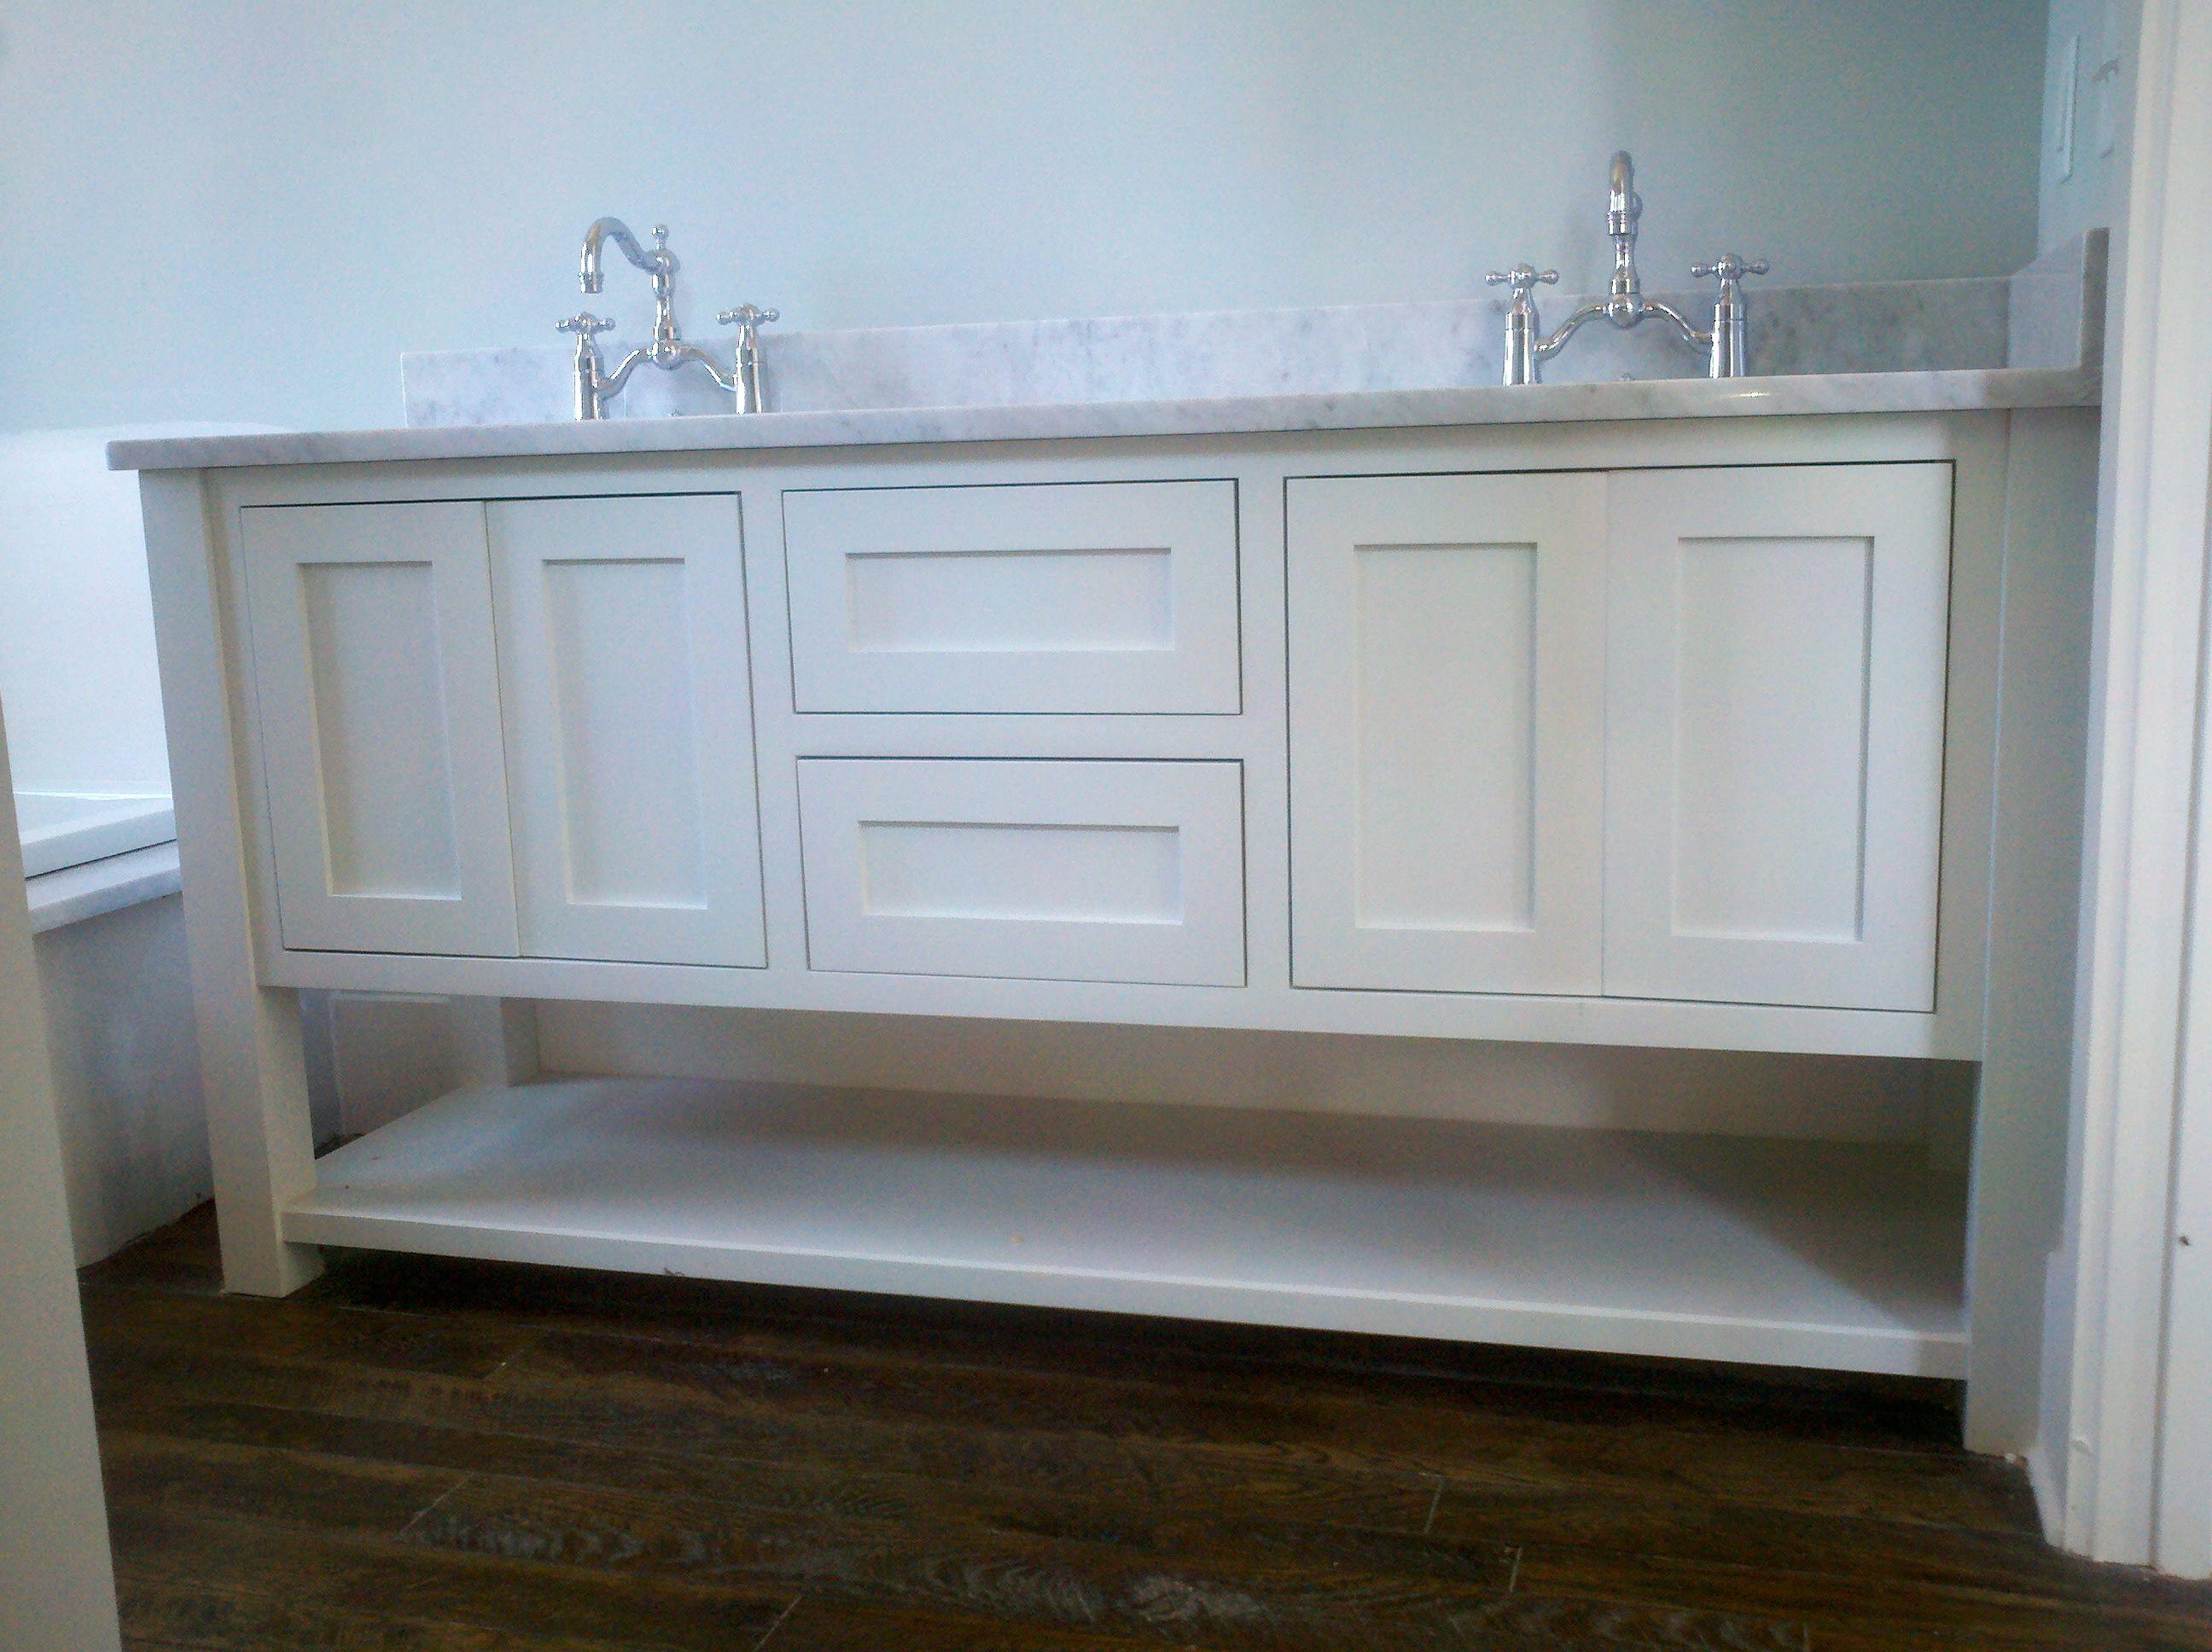 Custom Cabinet Furniture Bath Vanity, Inset Shaker Style Doors, Painted Finish, Arts